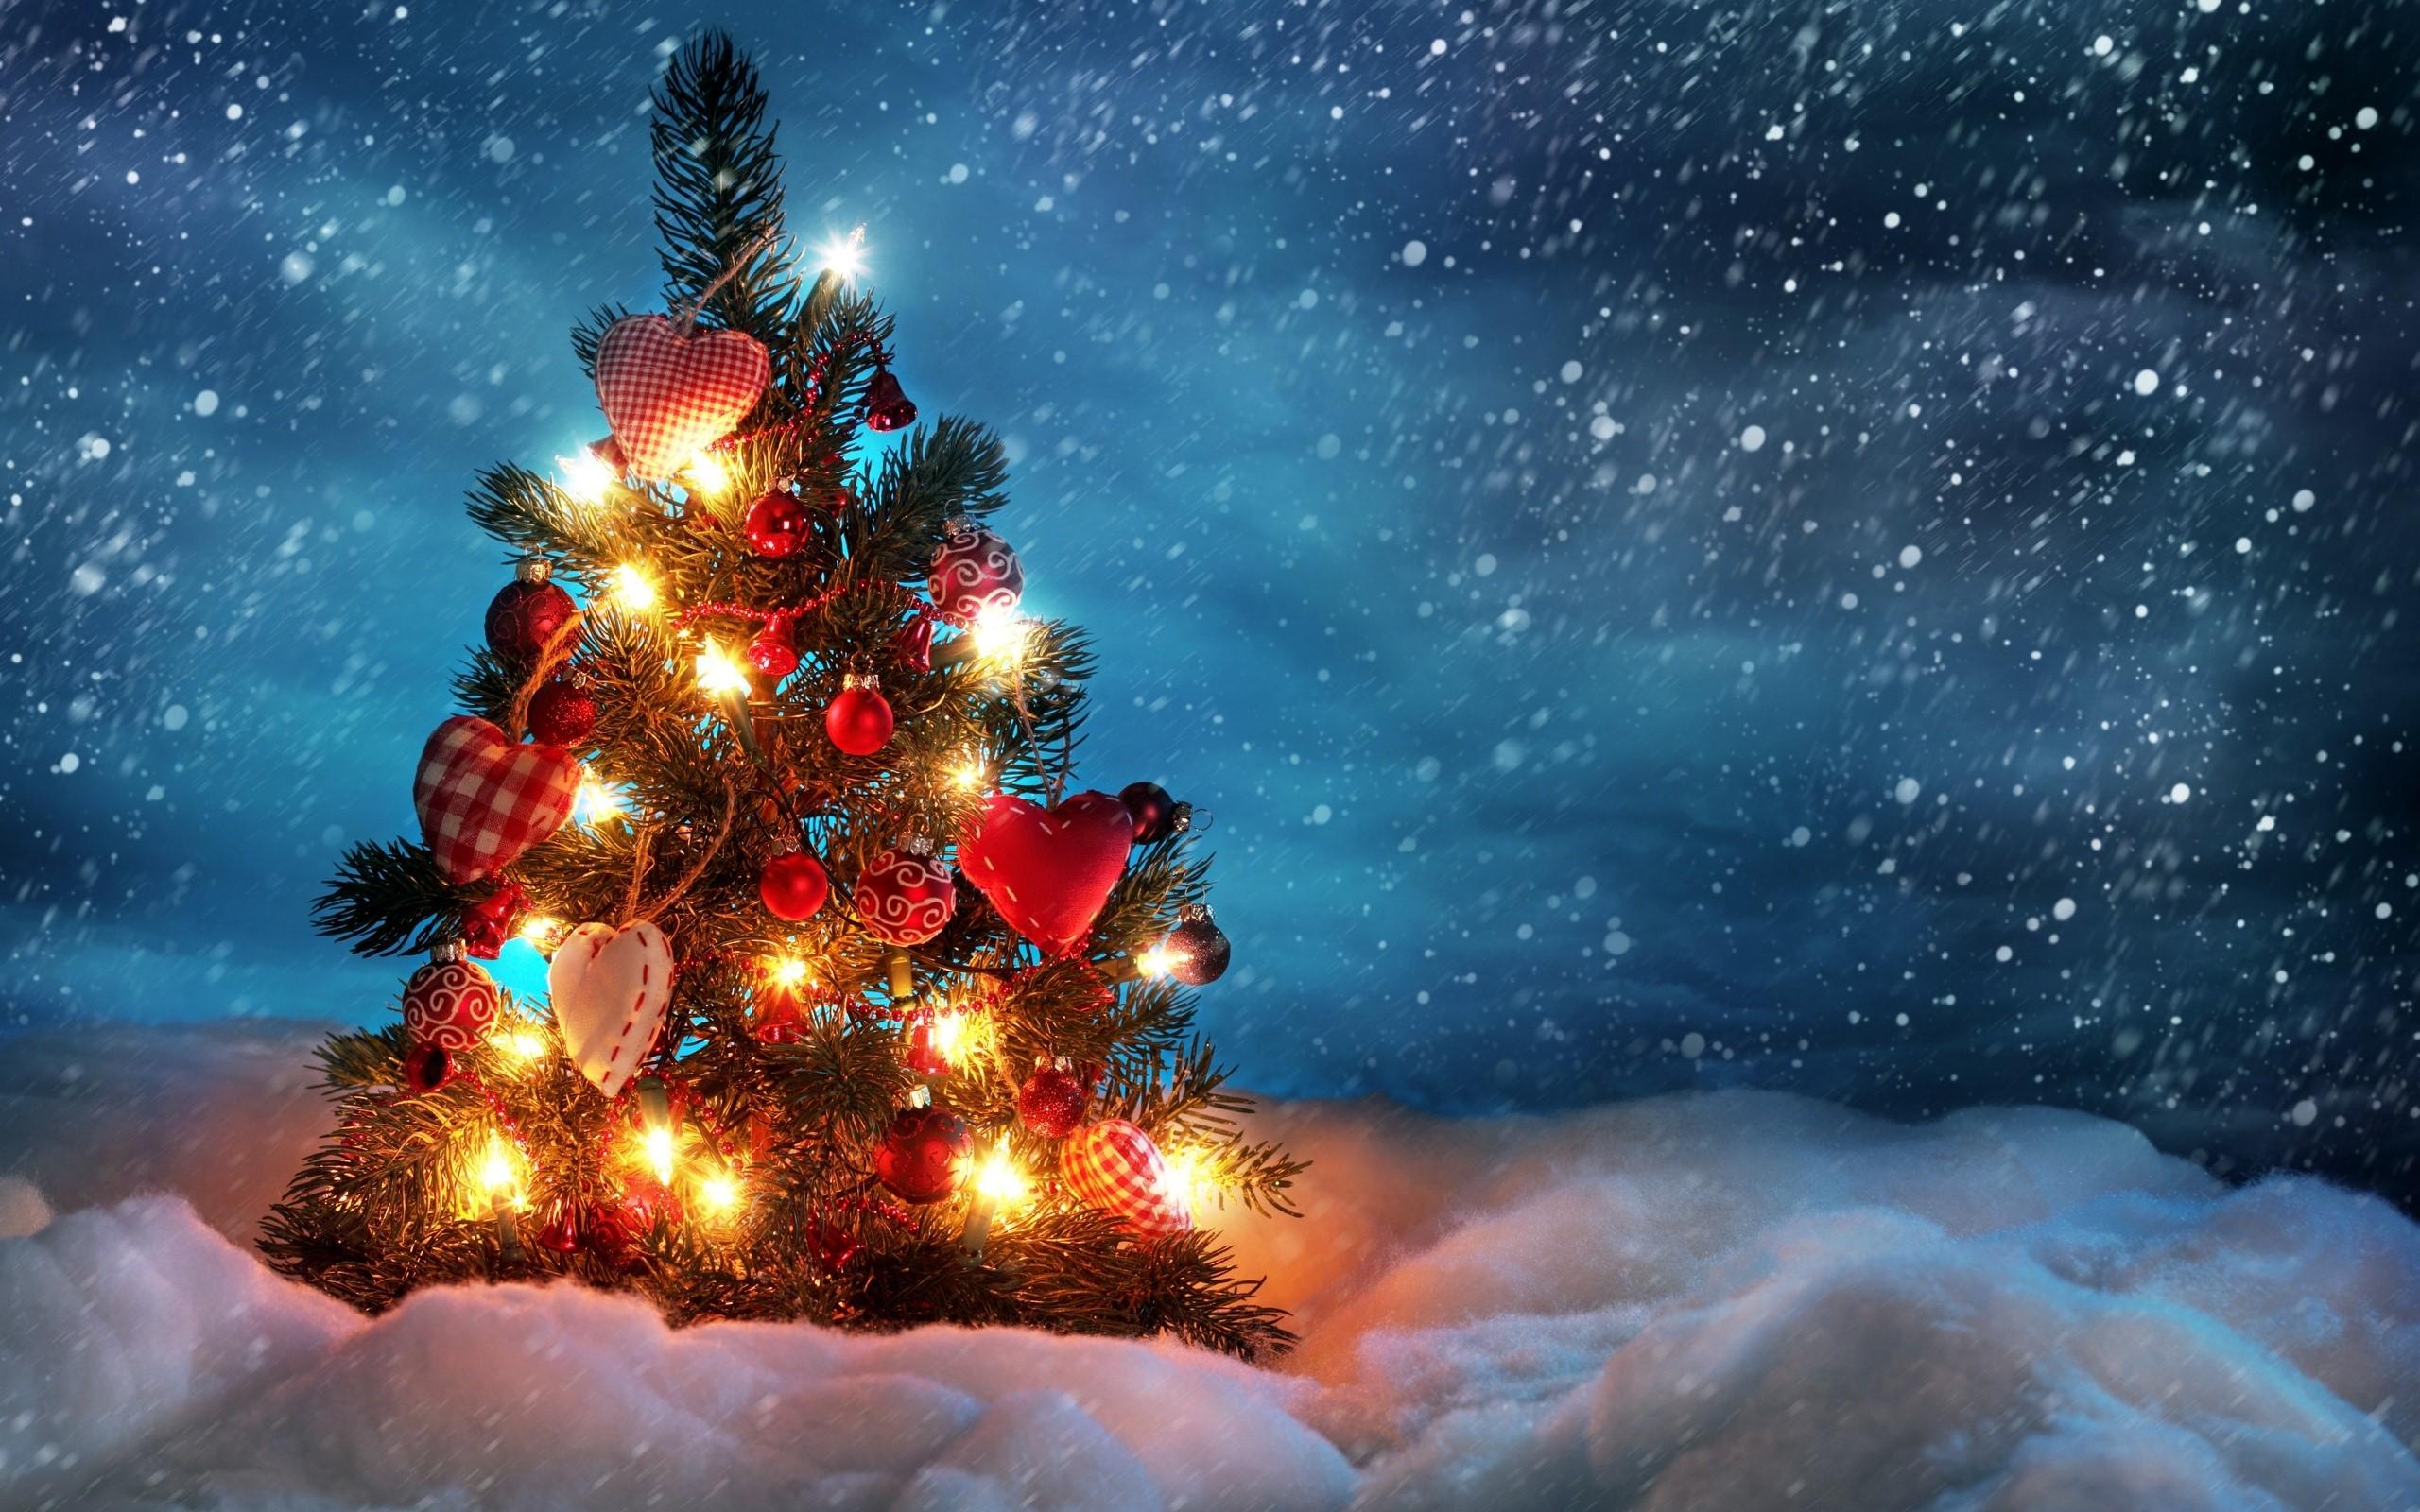 Wallpaper A beautiful Christmas tree